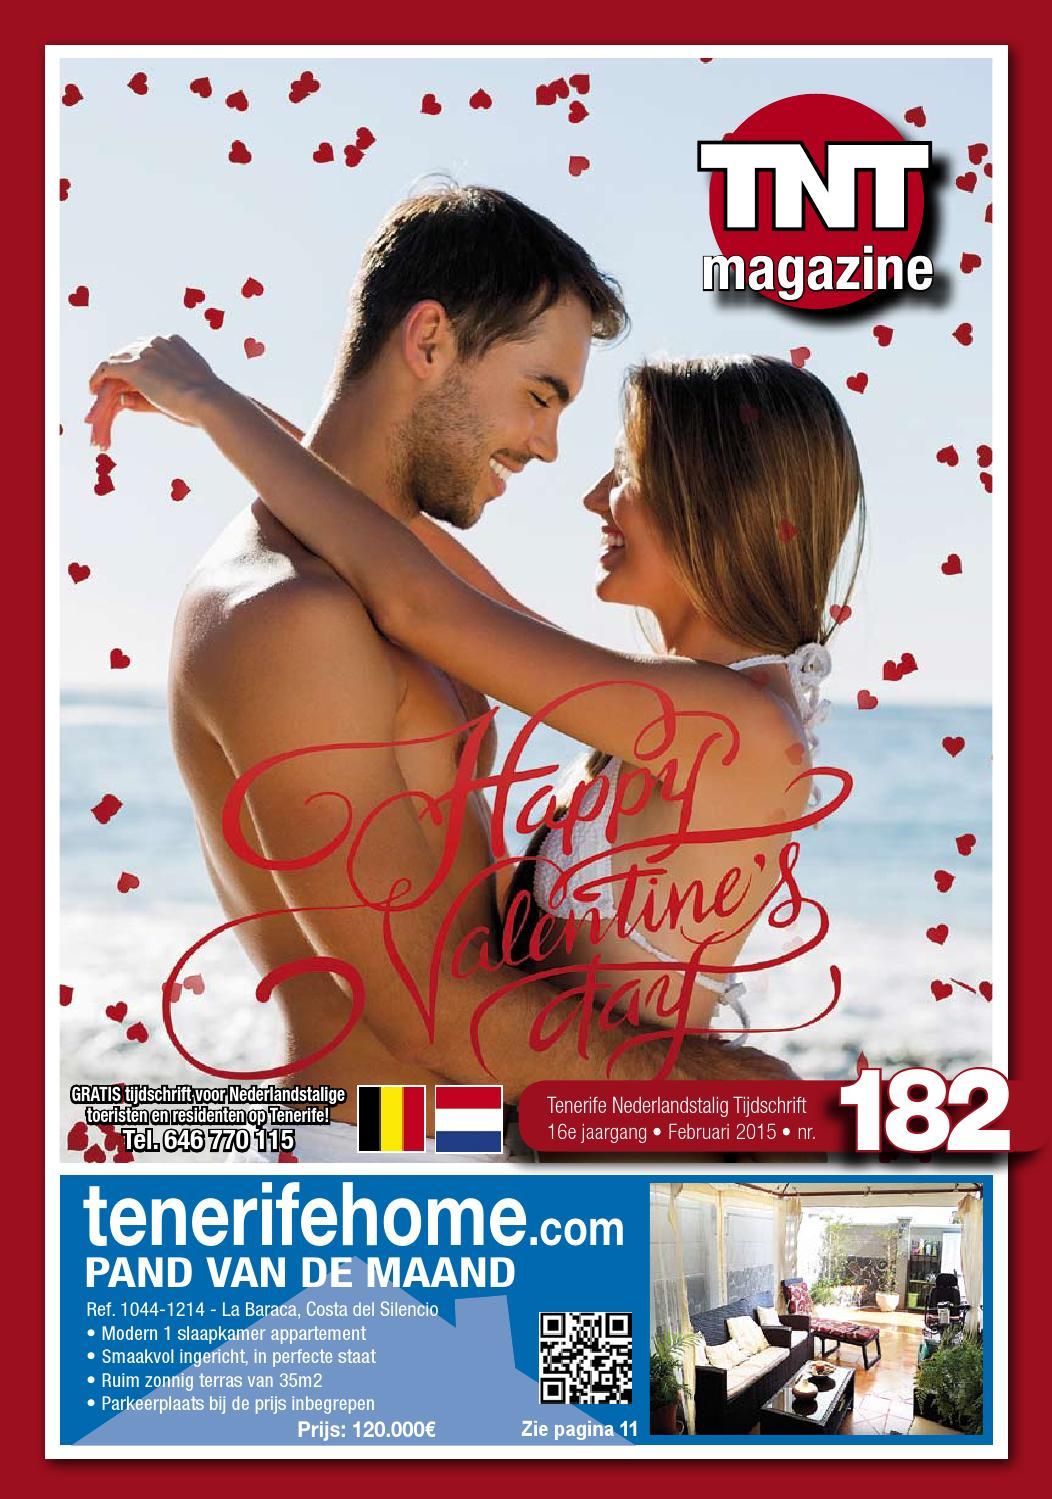 Tnt181 enero 2015 lr by TNT magazine - issuu